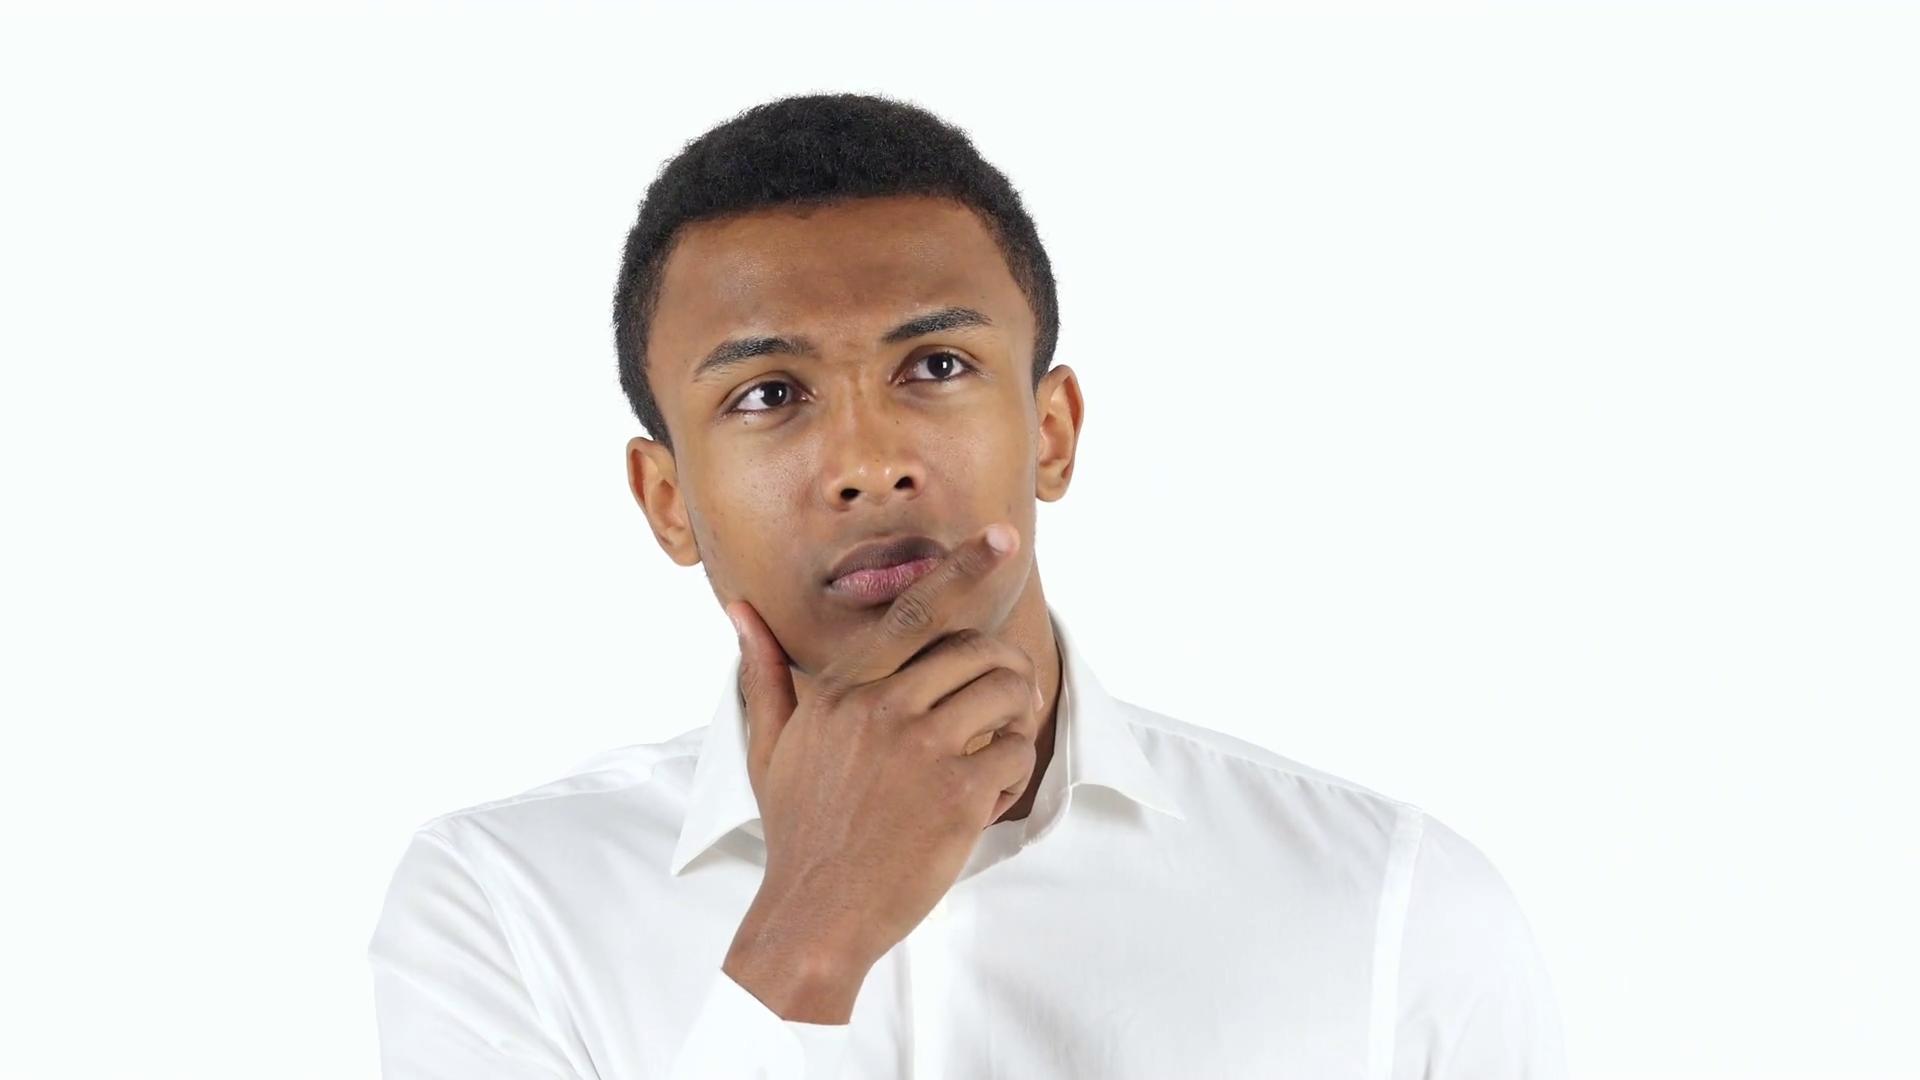 thinking-pensive-black-man-on-white-background_reqbxvawe_thumbnail-full08